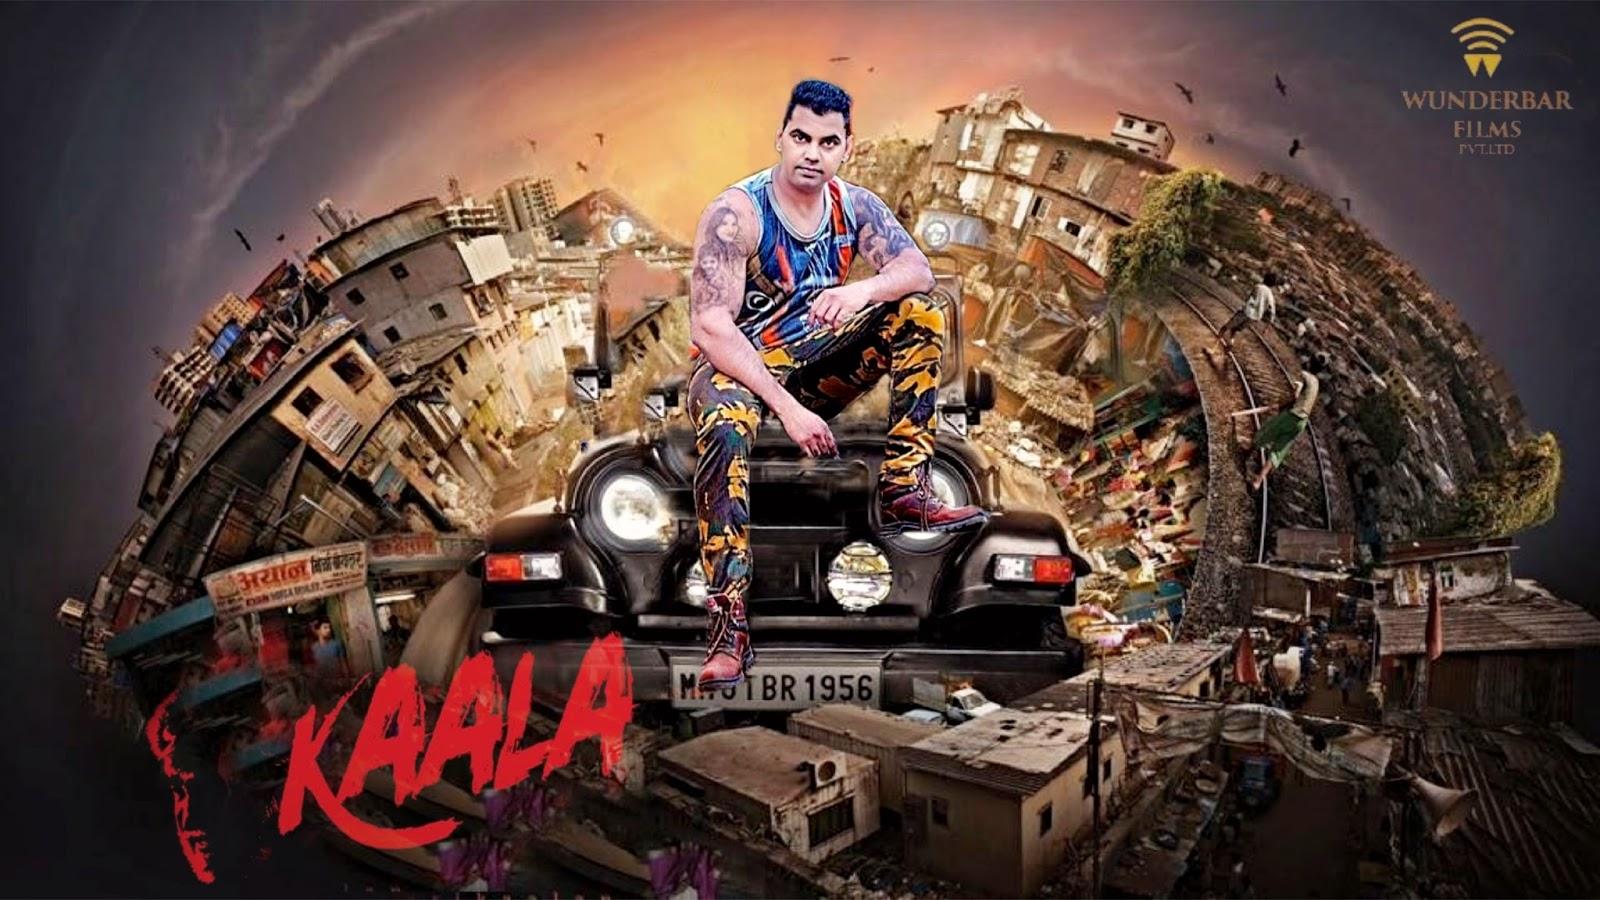 movie poster background download picsart ki duniya